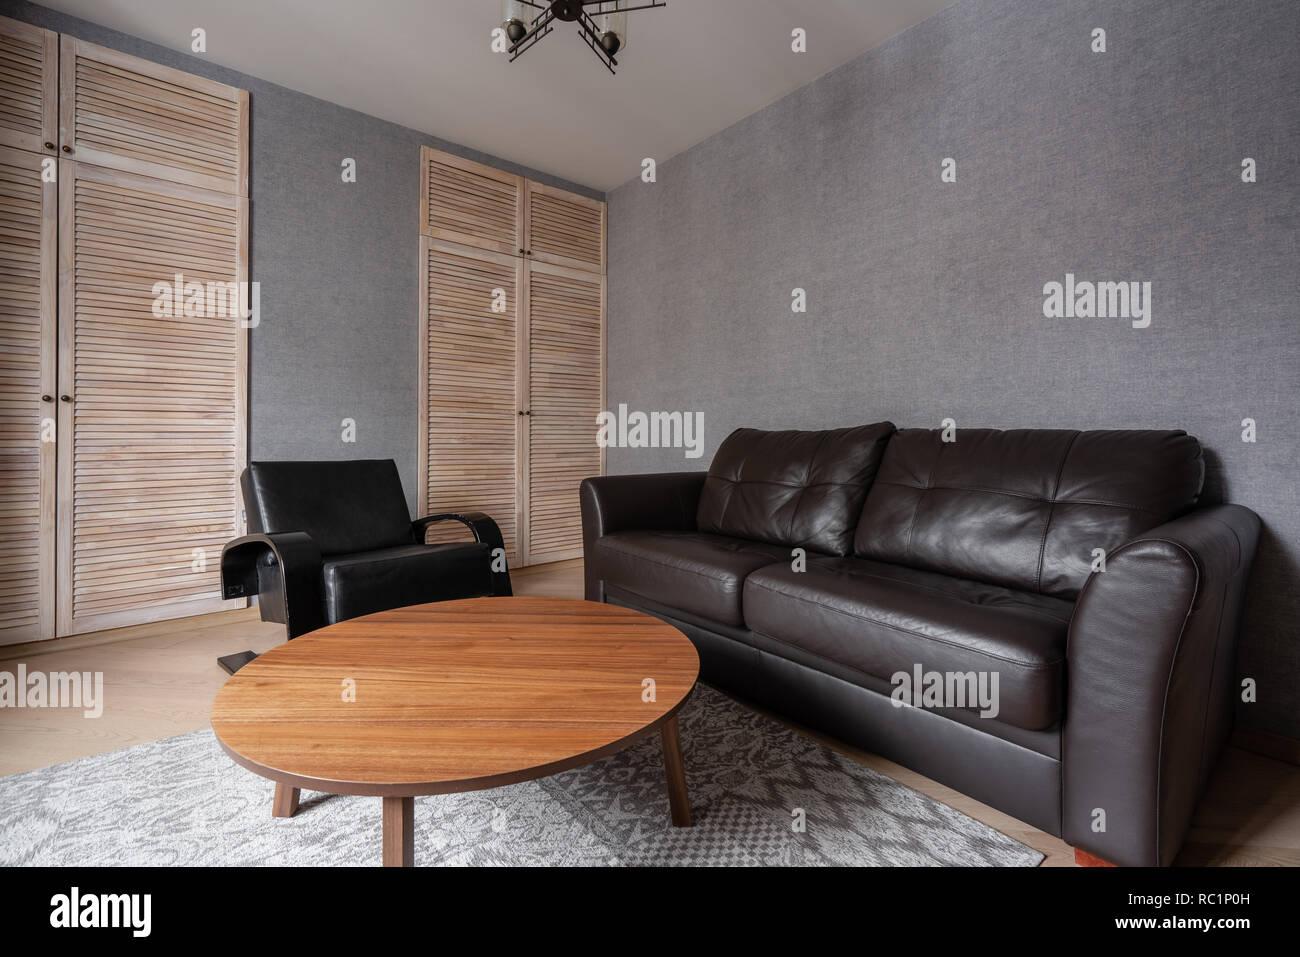 Russia Nizhny Novgorod Gennaio 10 2018 Appartamento Privato